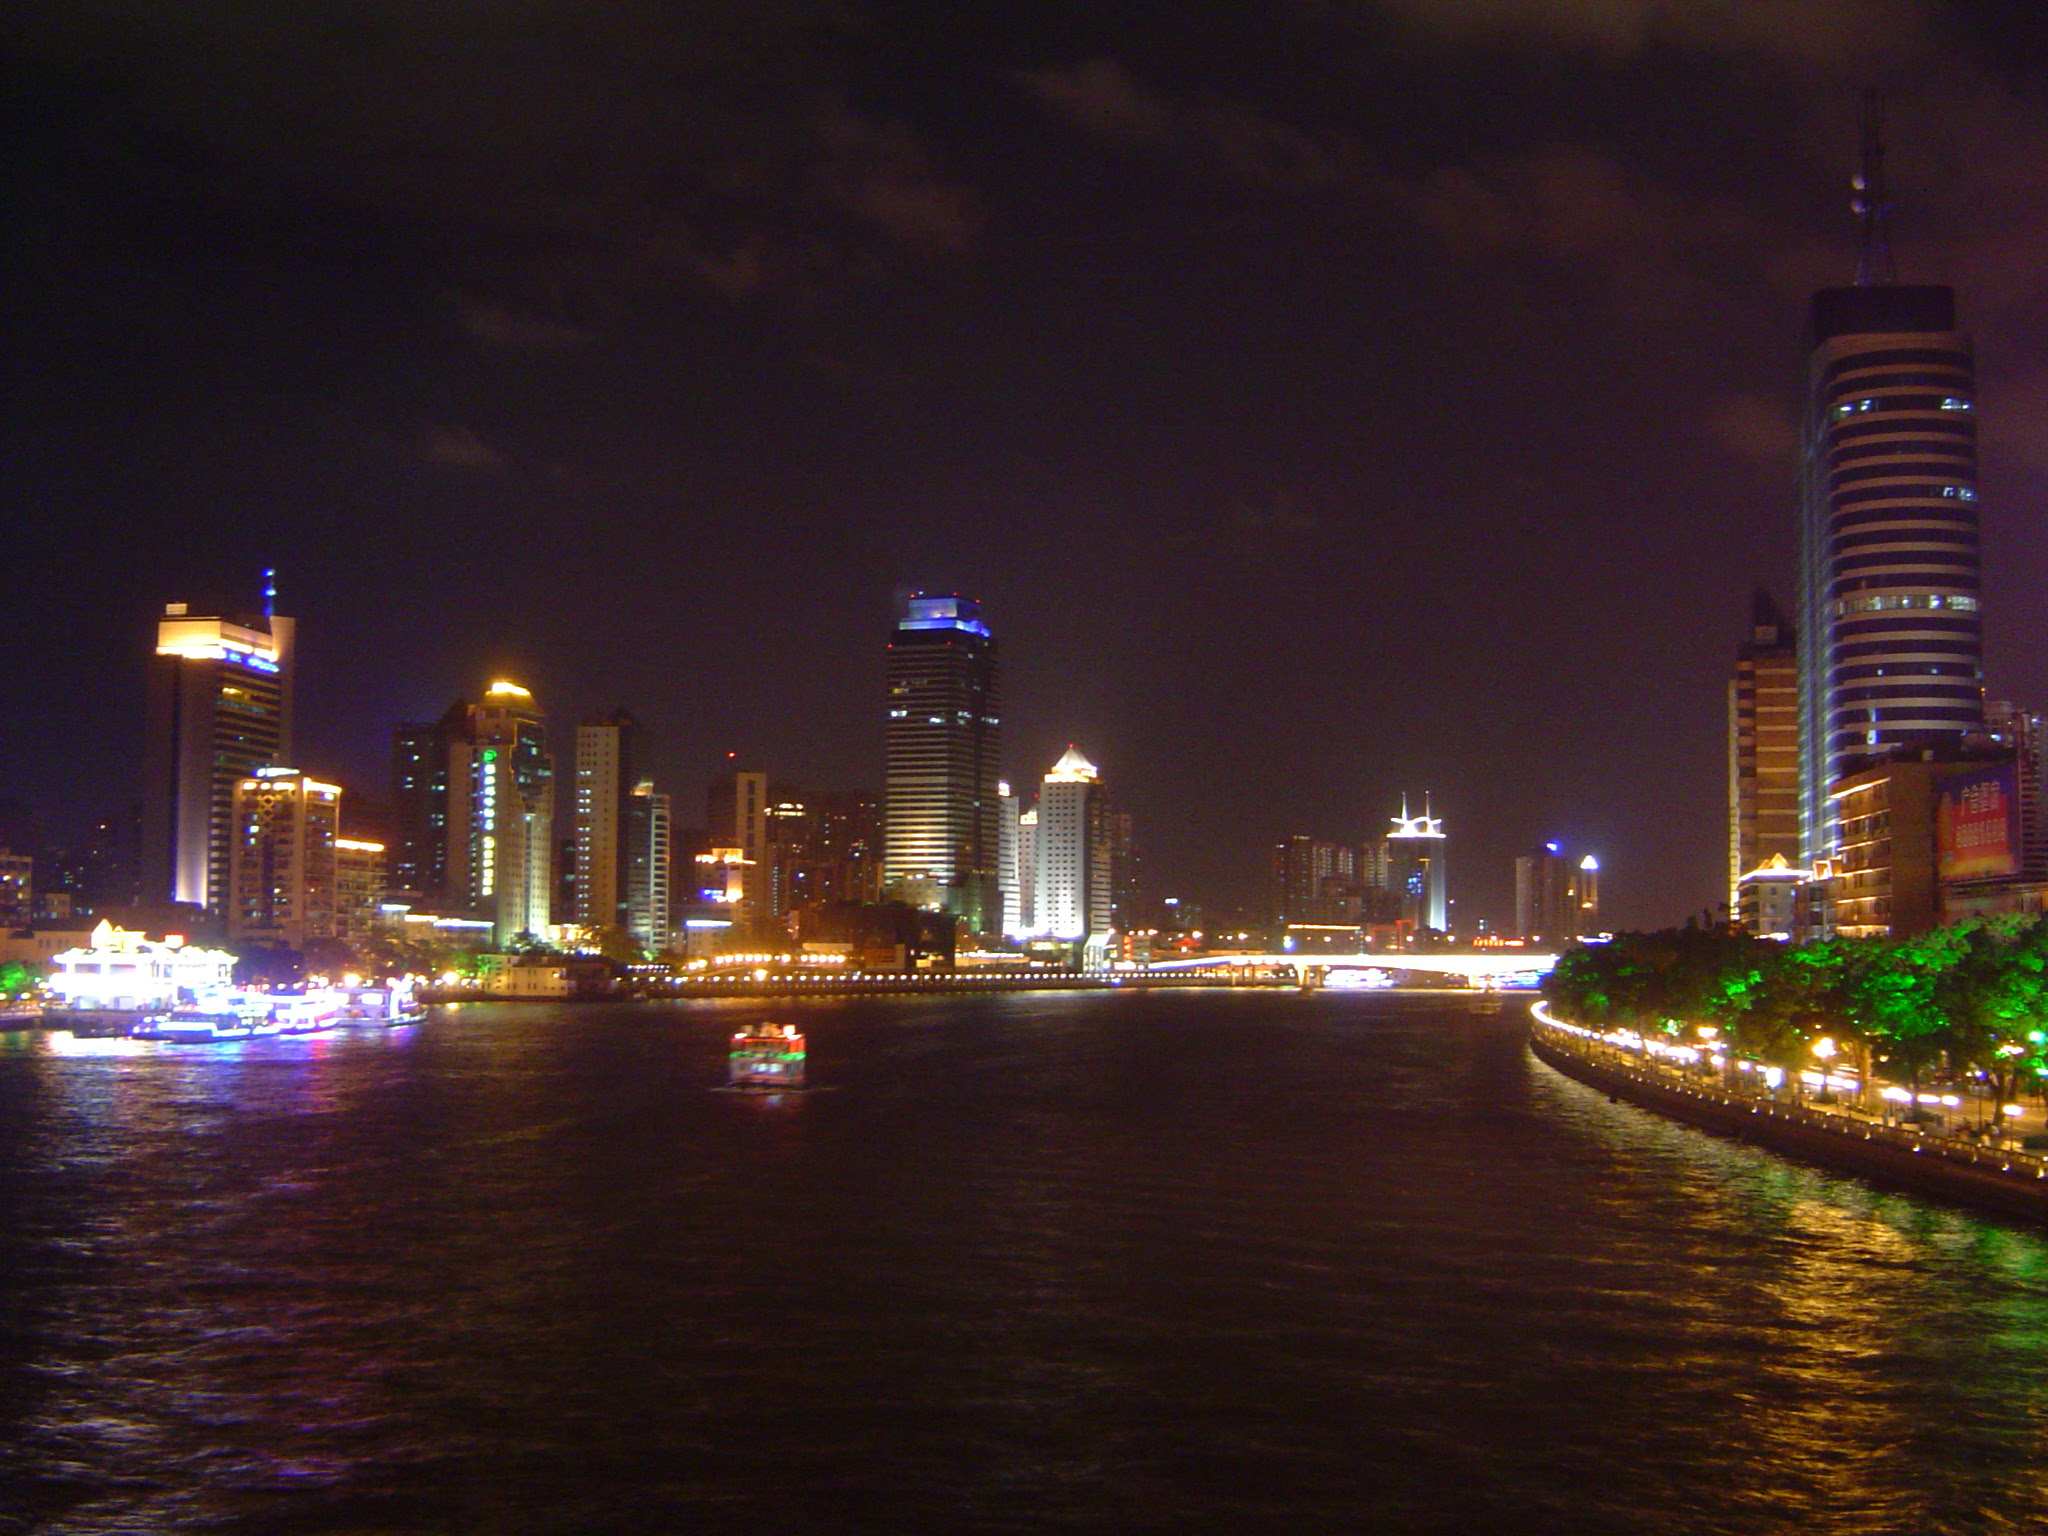 http://upload.wikimedia.org/wikipedia/commons/d/da/Pearl_River_in_Guangzhou.JPG